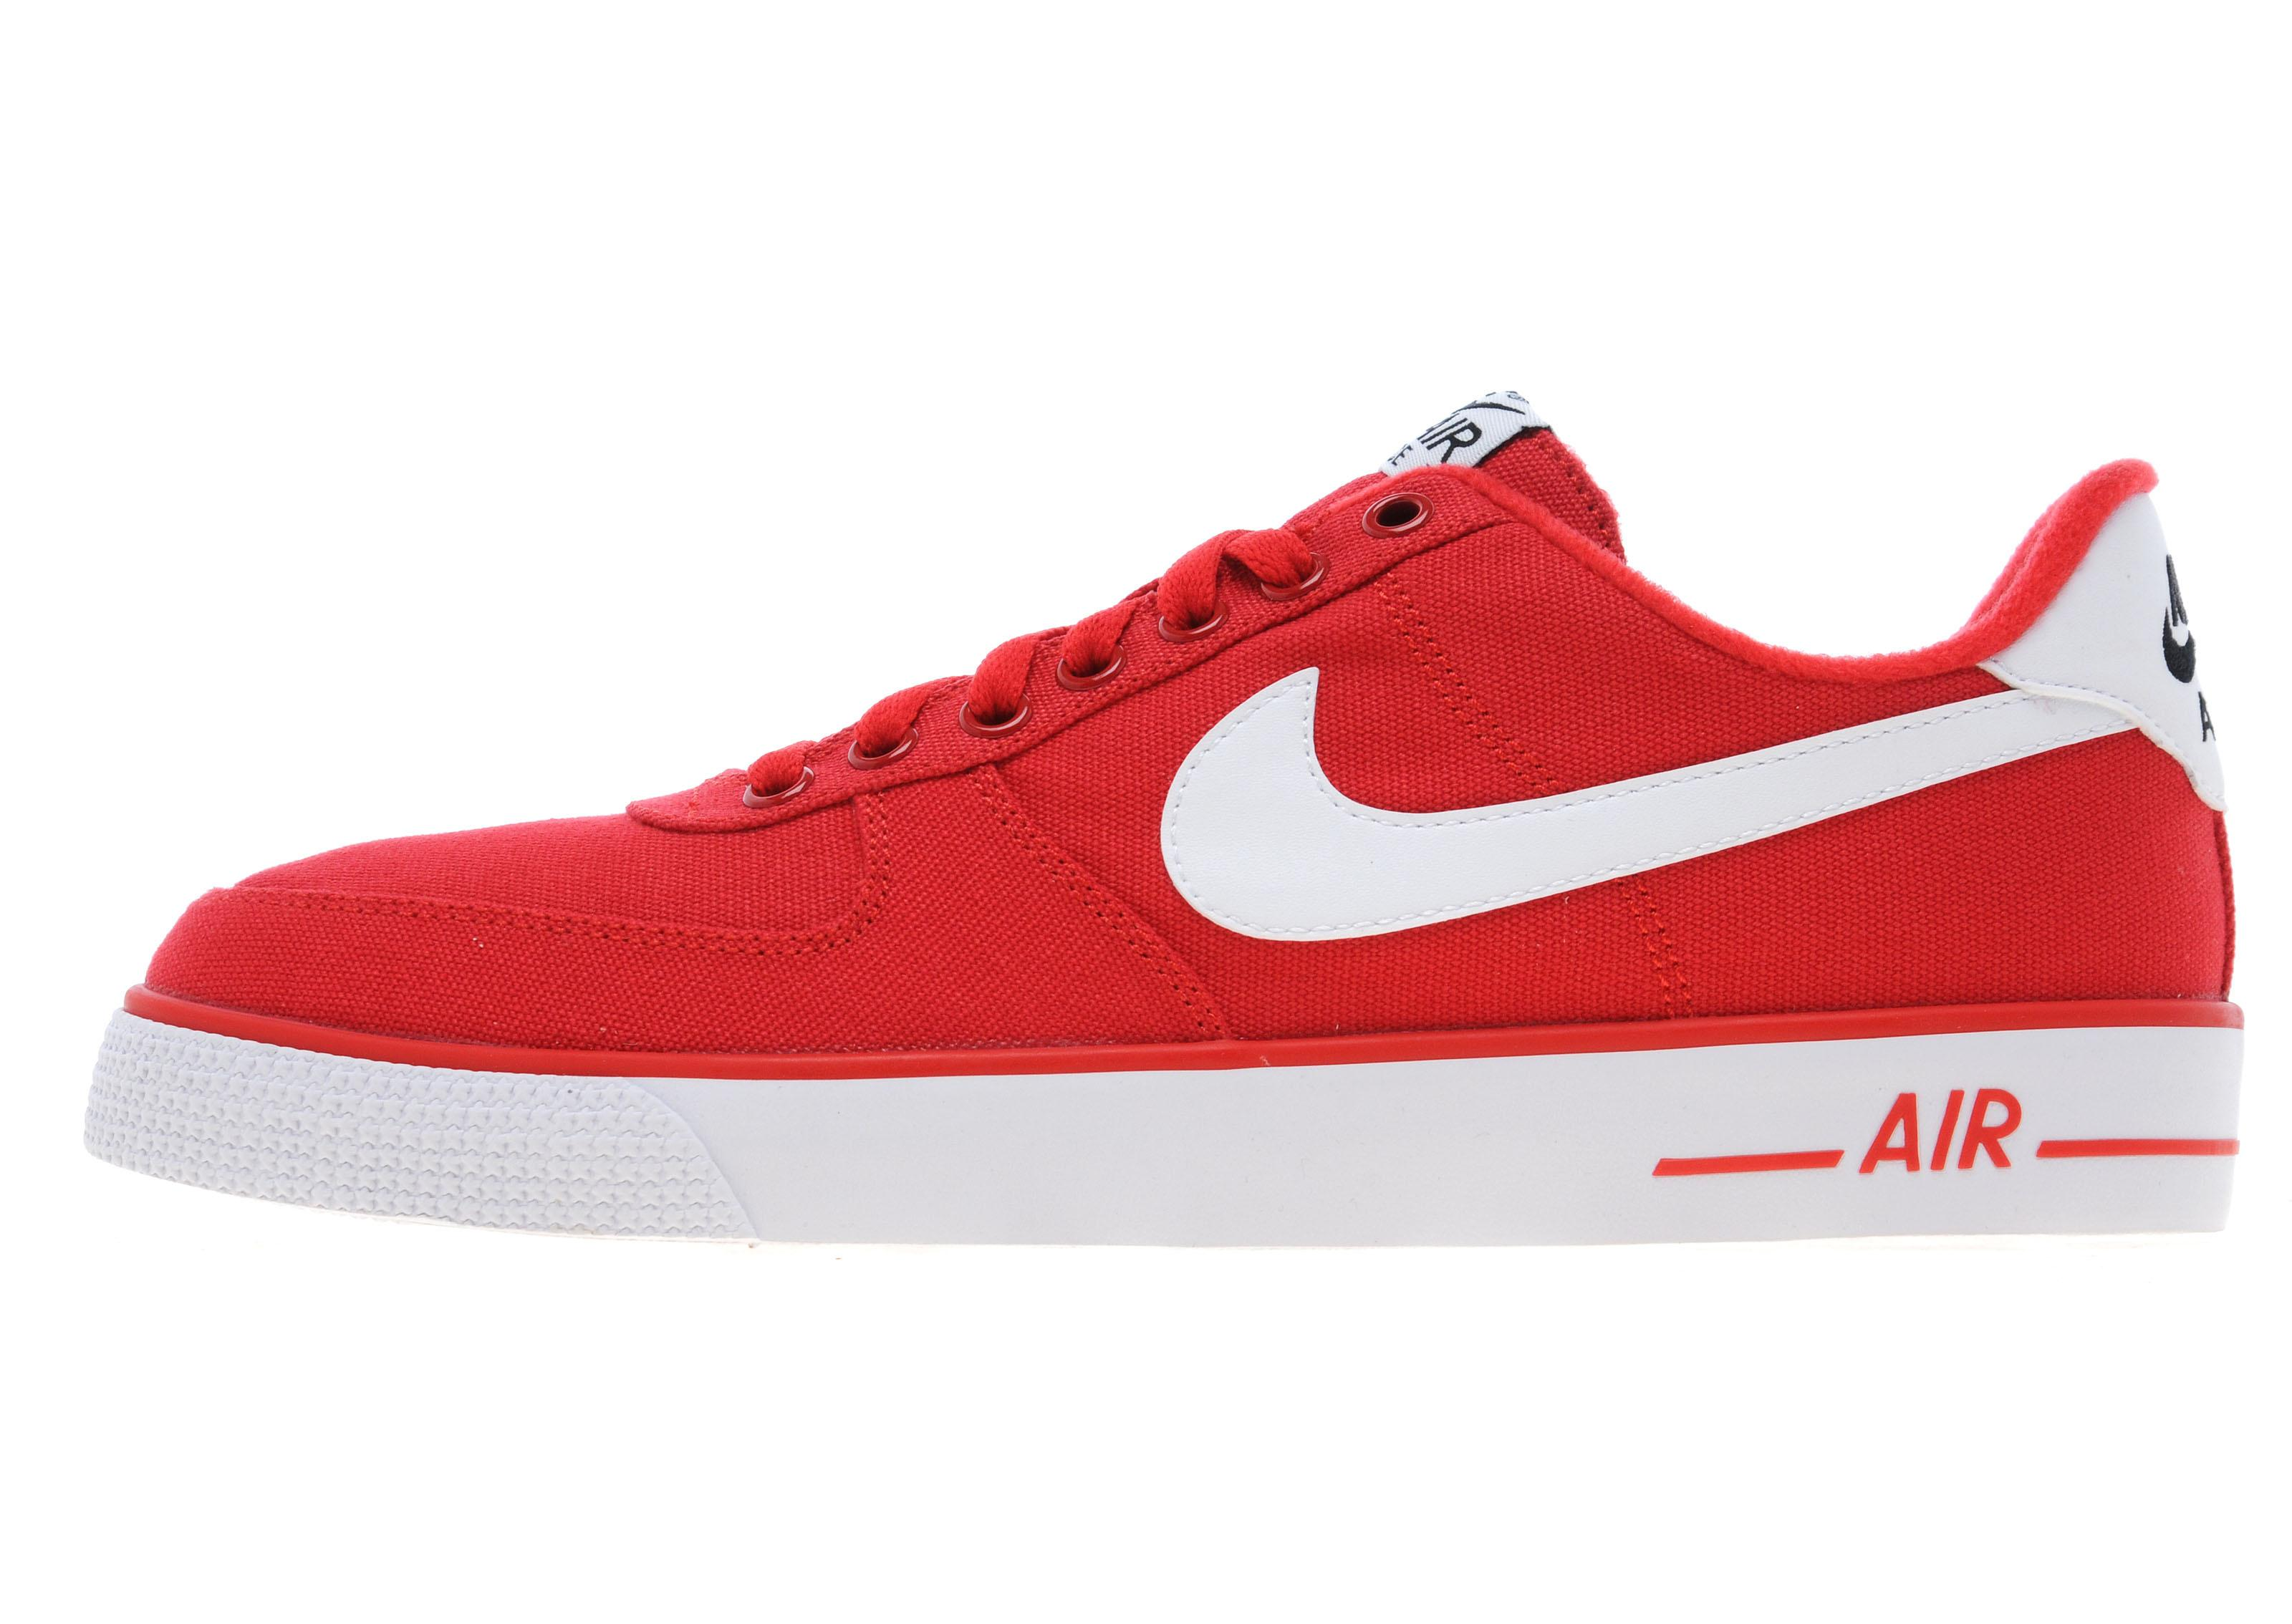 Nike Shox Uomo Prezzi Bassi